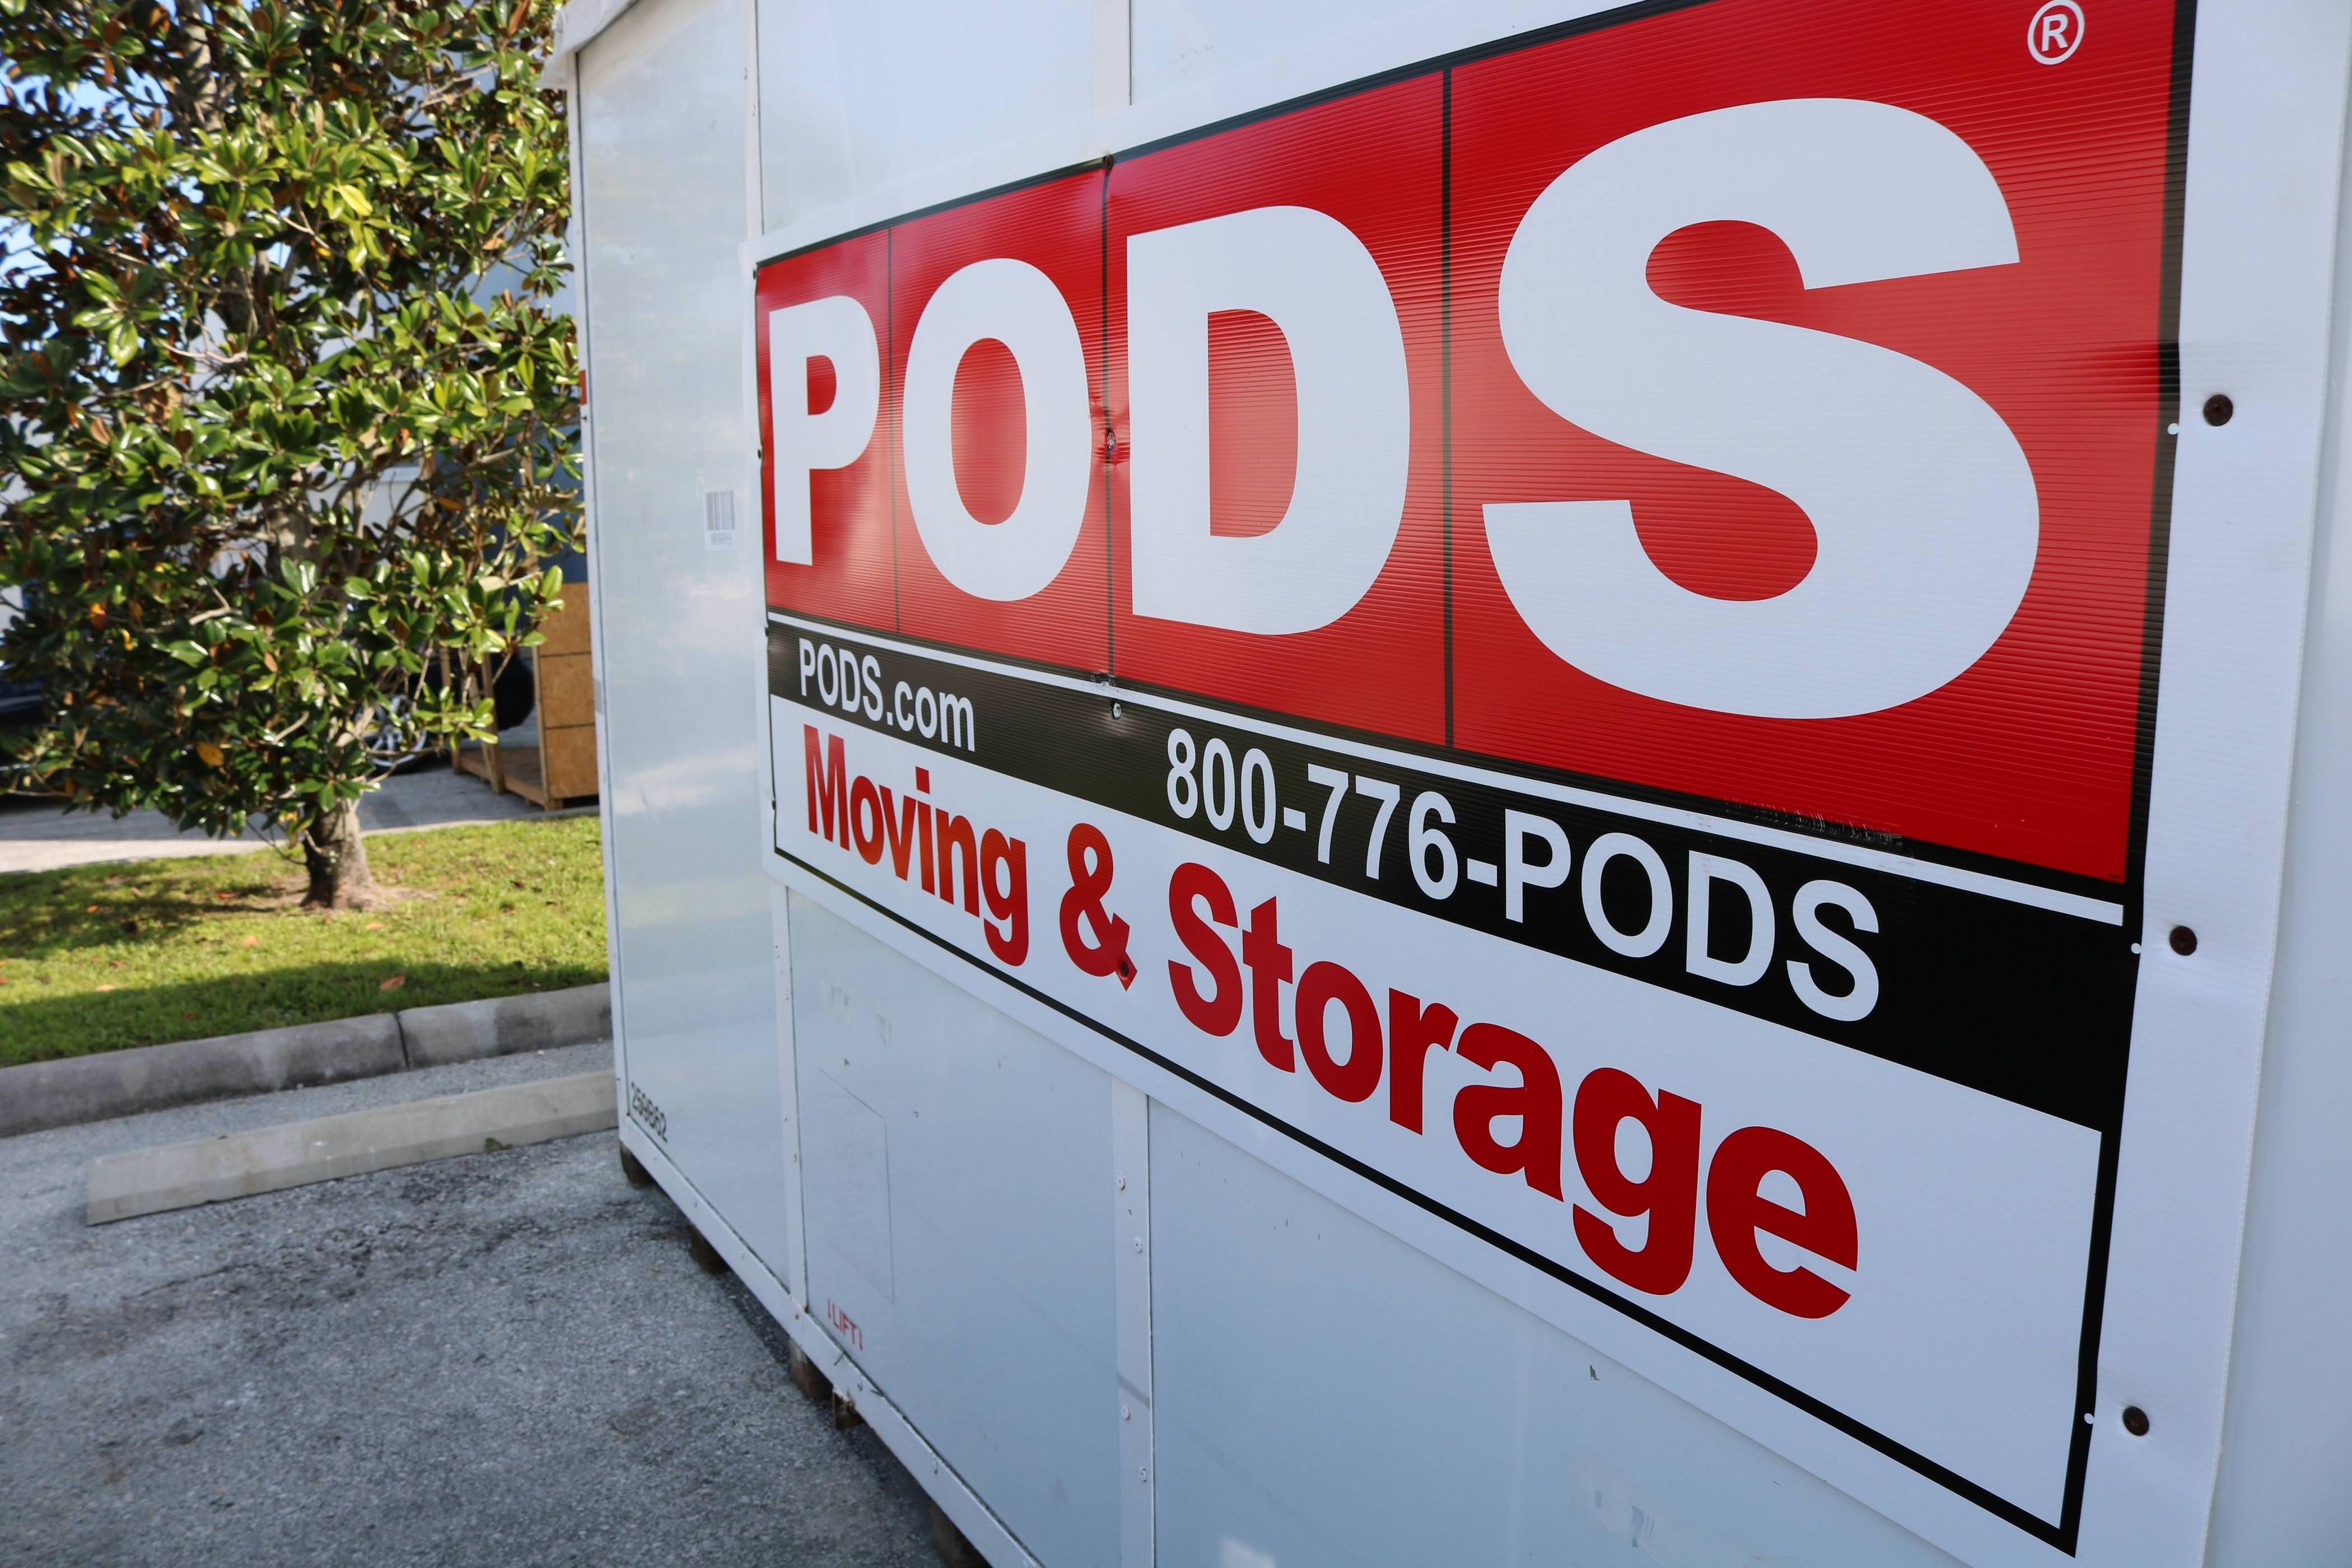 PODS - Greenville, SC